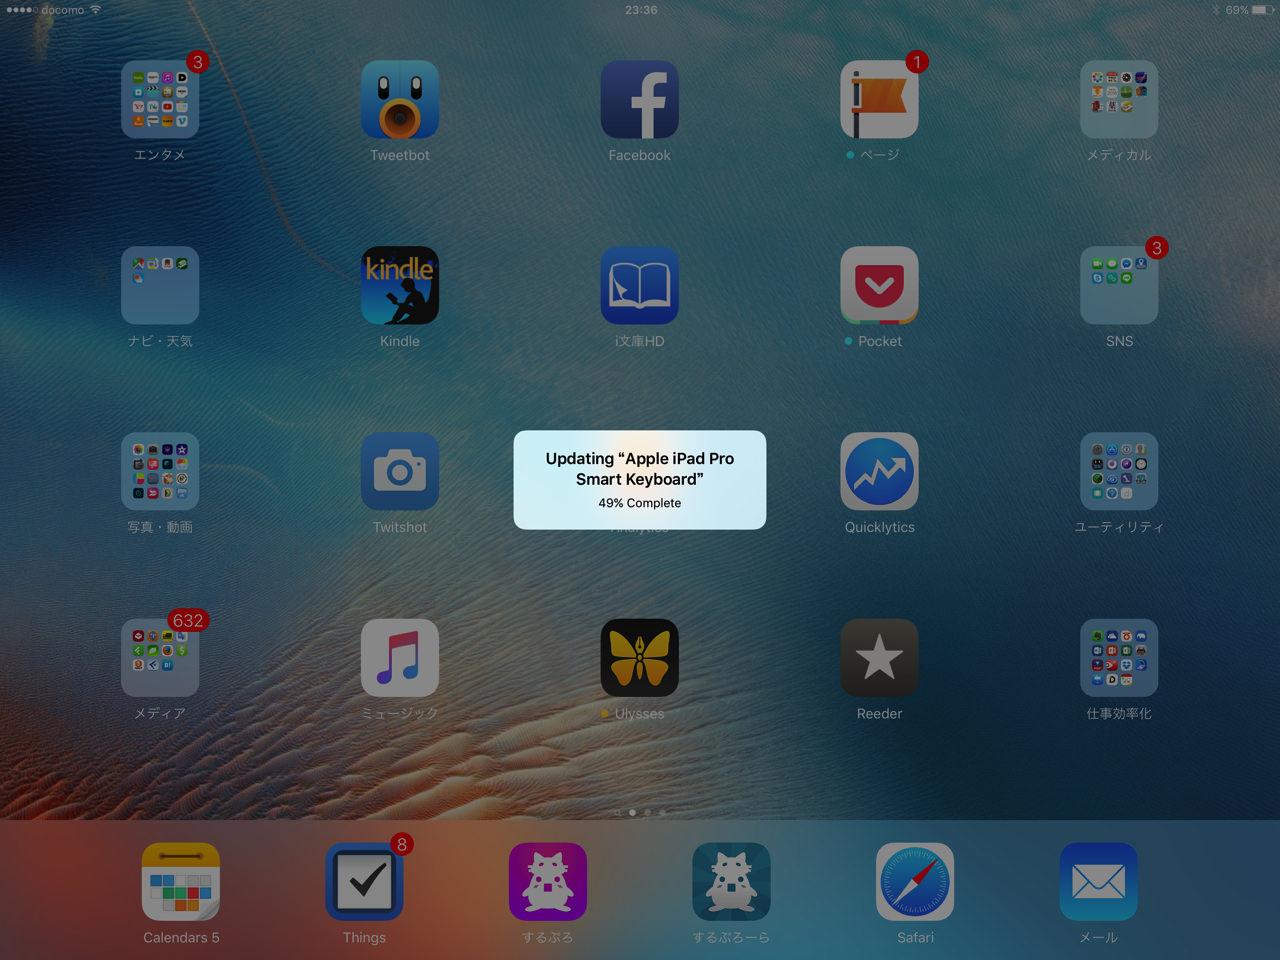 Ipad pro smart keyboard software update3